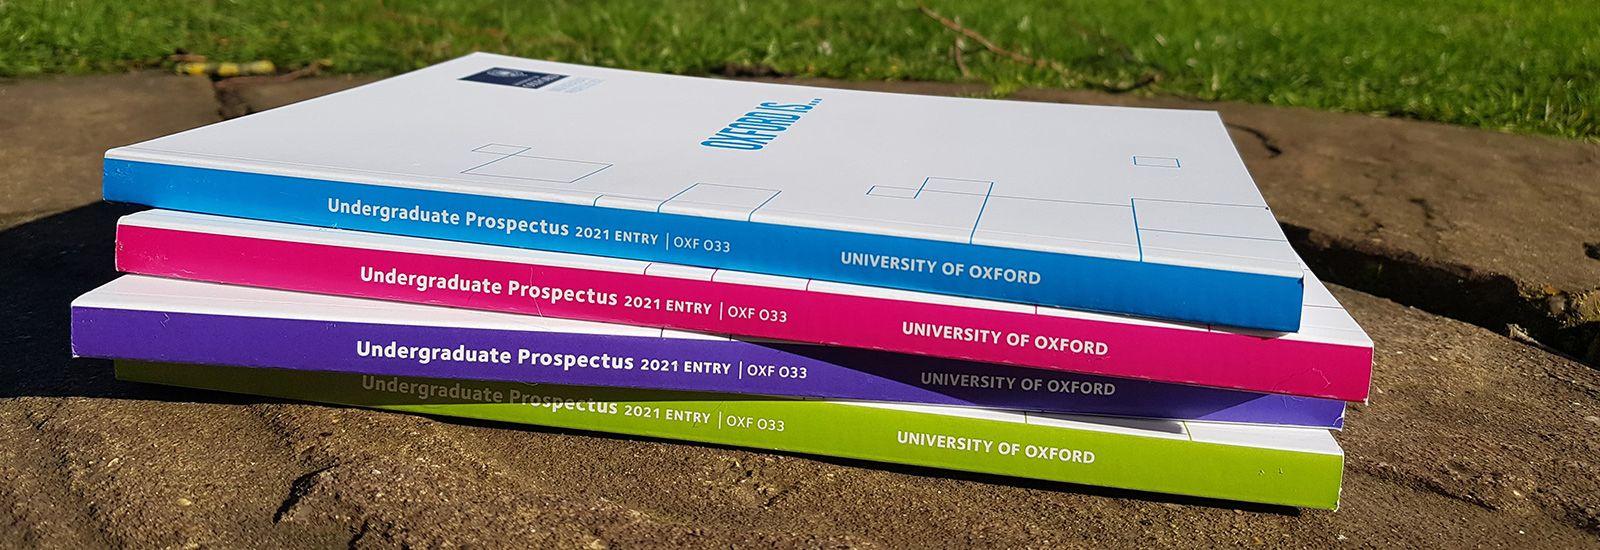 2021 entry undergraduate prospectus